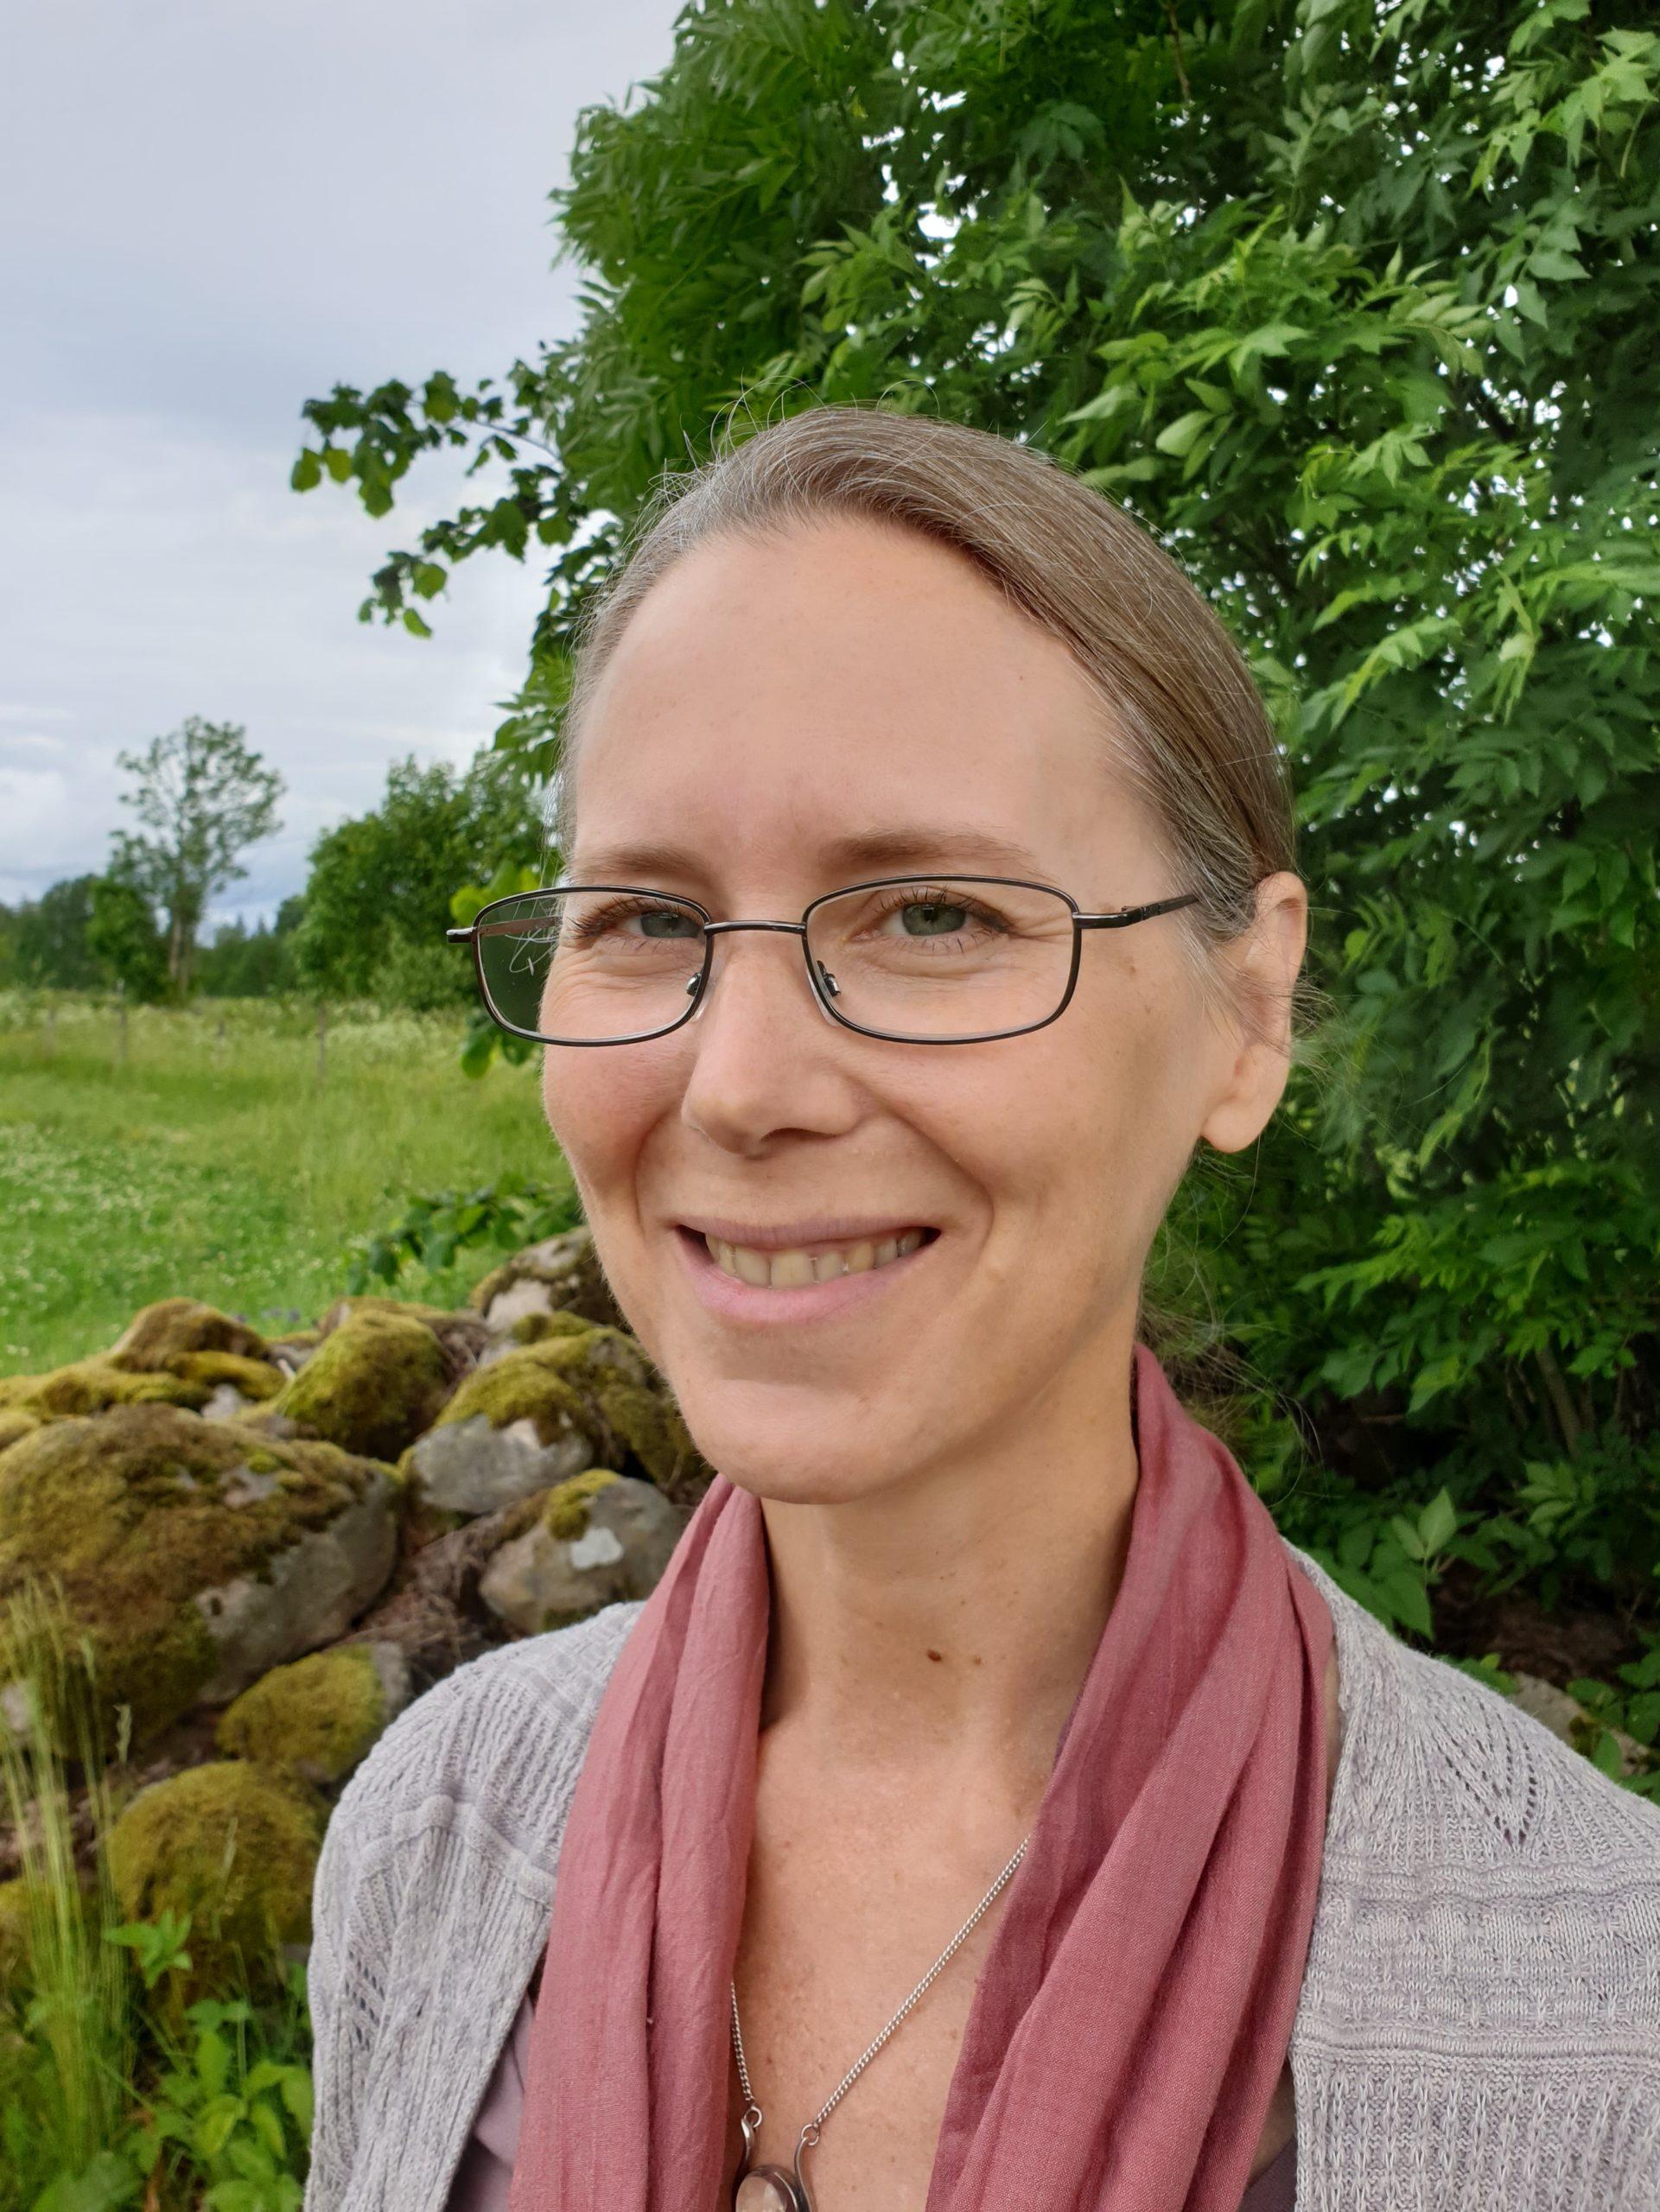 Helena Falkman